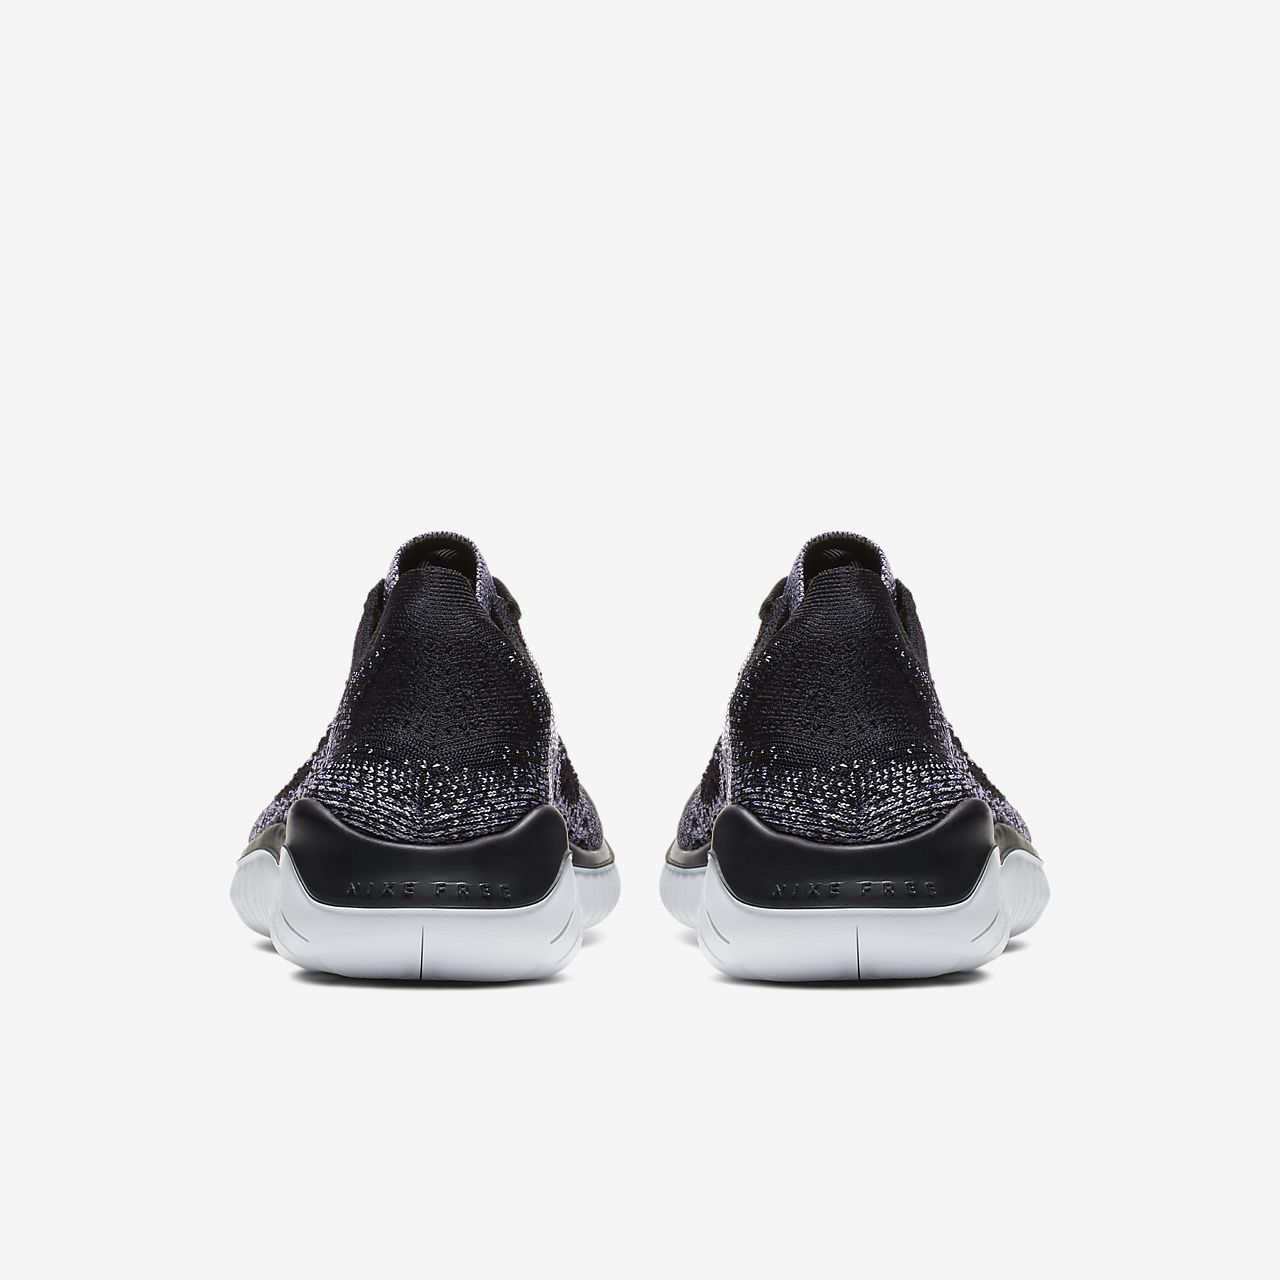 Nike Wmns Nike Libre Rn Flyknit 2018 Bas-tops Et Chaussures De Sport pLFD7261